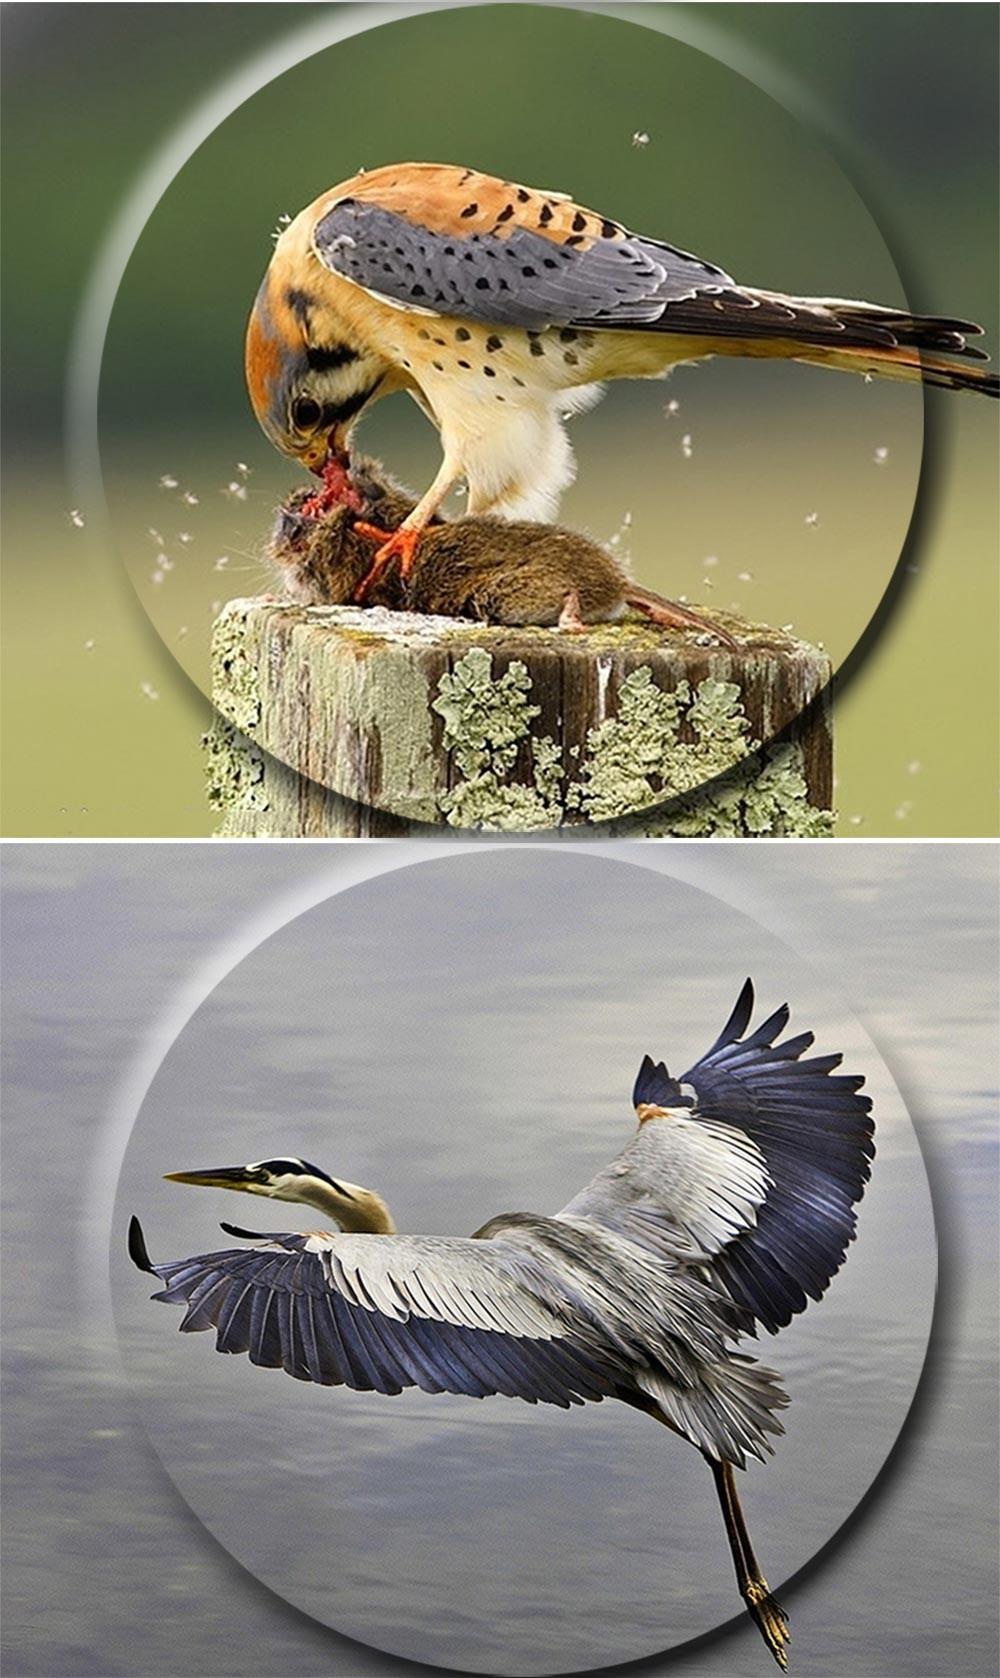 JouFou 20-60X80 HD Spotting Scope Waterproof Zoom Target Shooting Optical Glass High Power with Tripod Birdwatching (9)